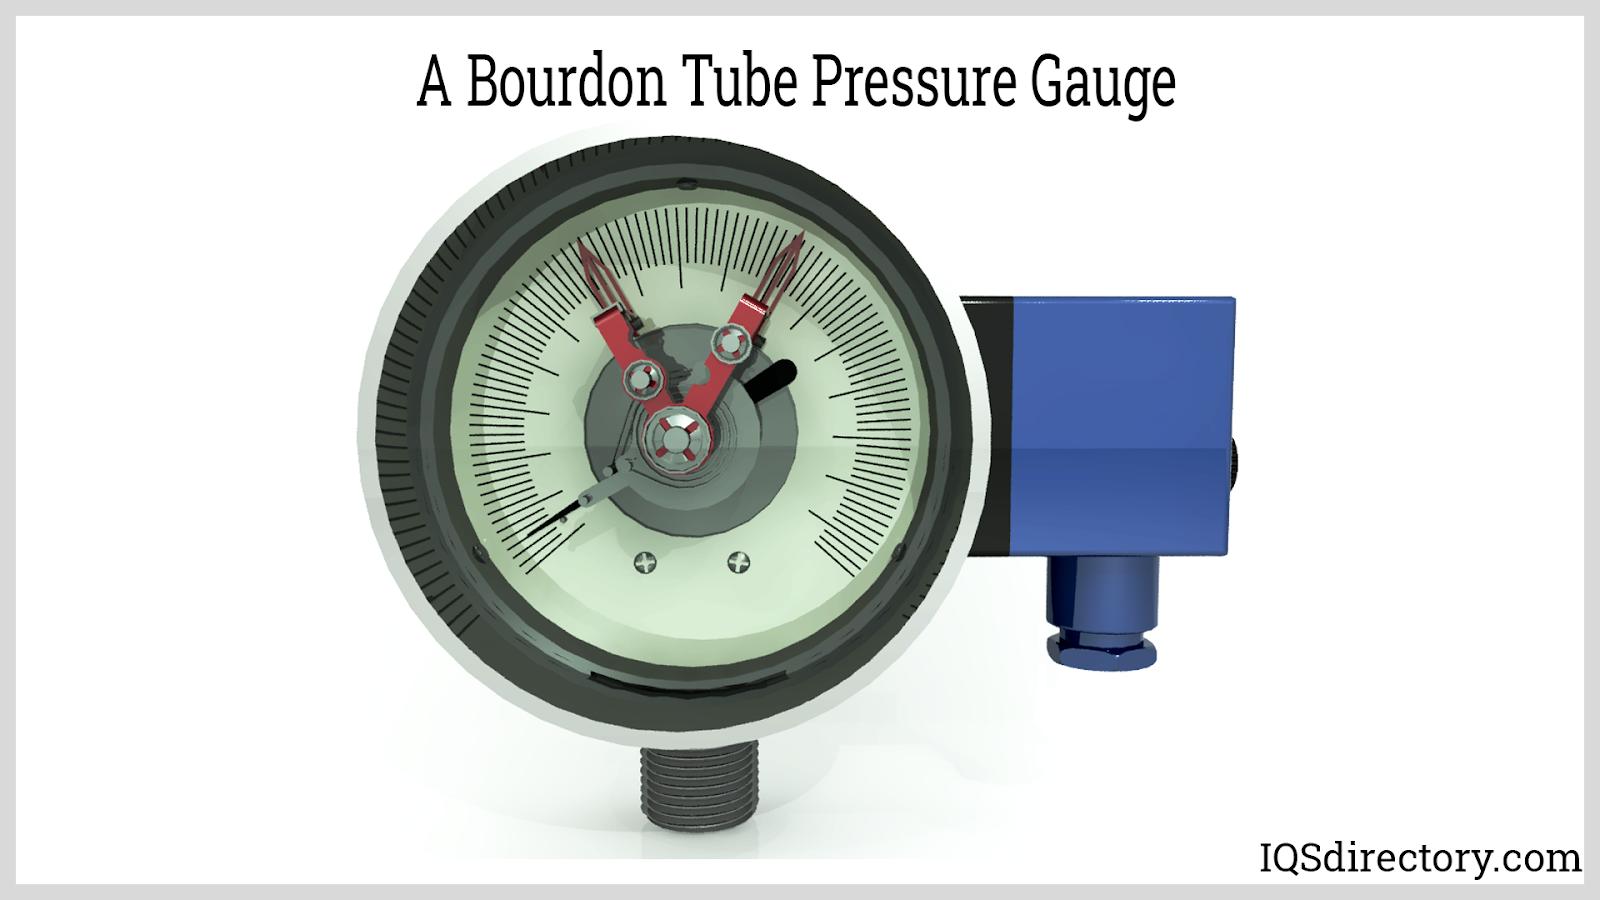 A Bourdon Tube Pressure Gauge